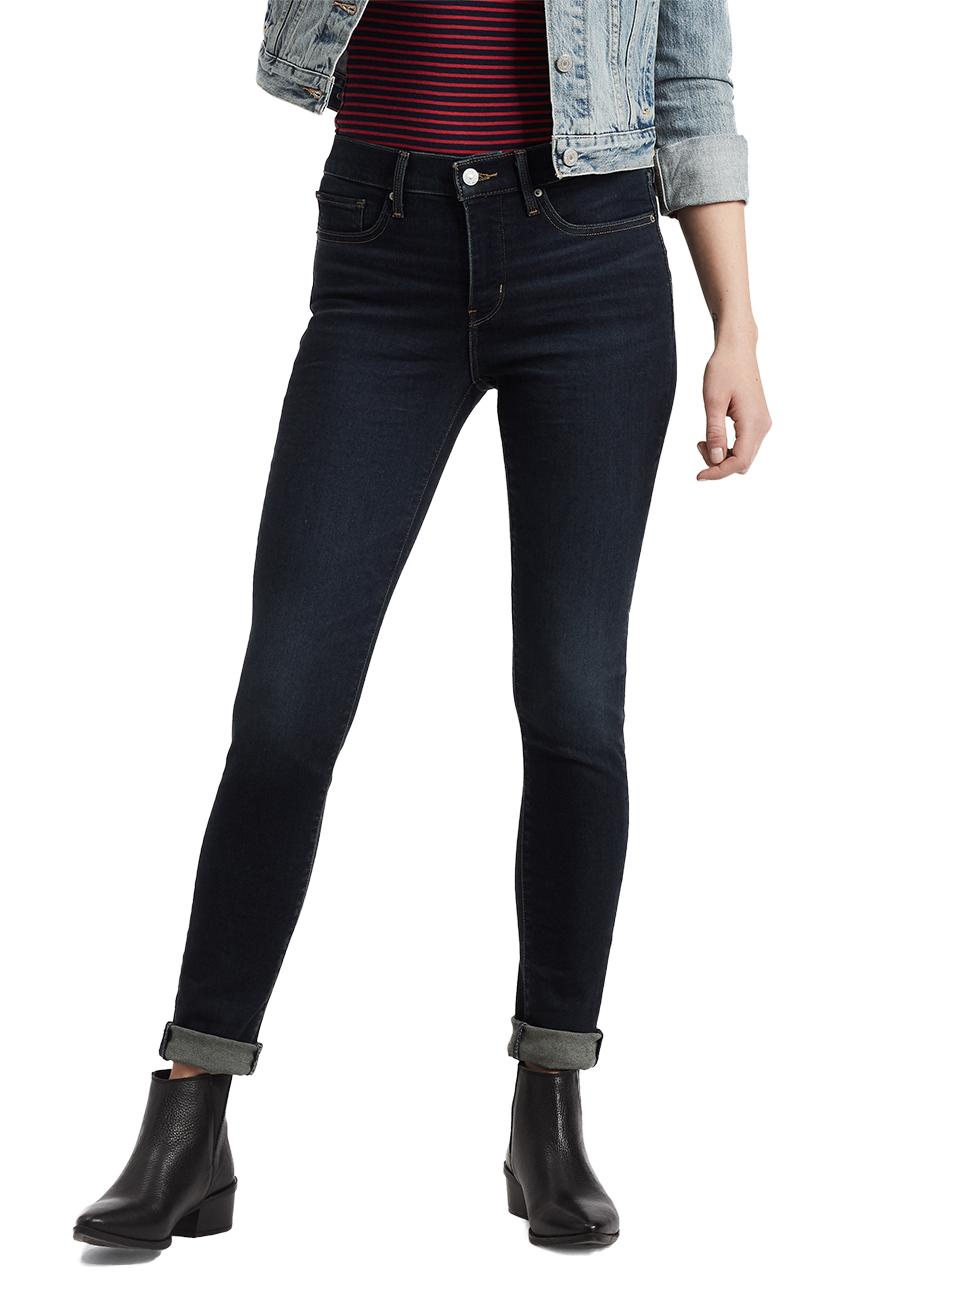 Levis® Damen Jeans 311 Shaping Skinny Fit Blau London Nights